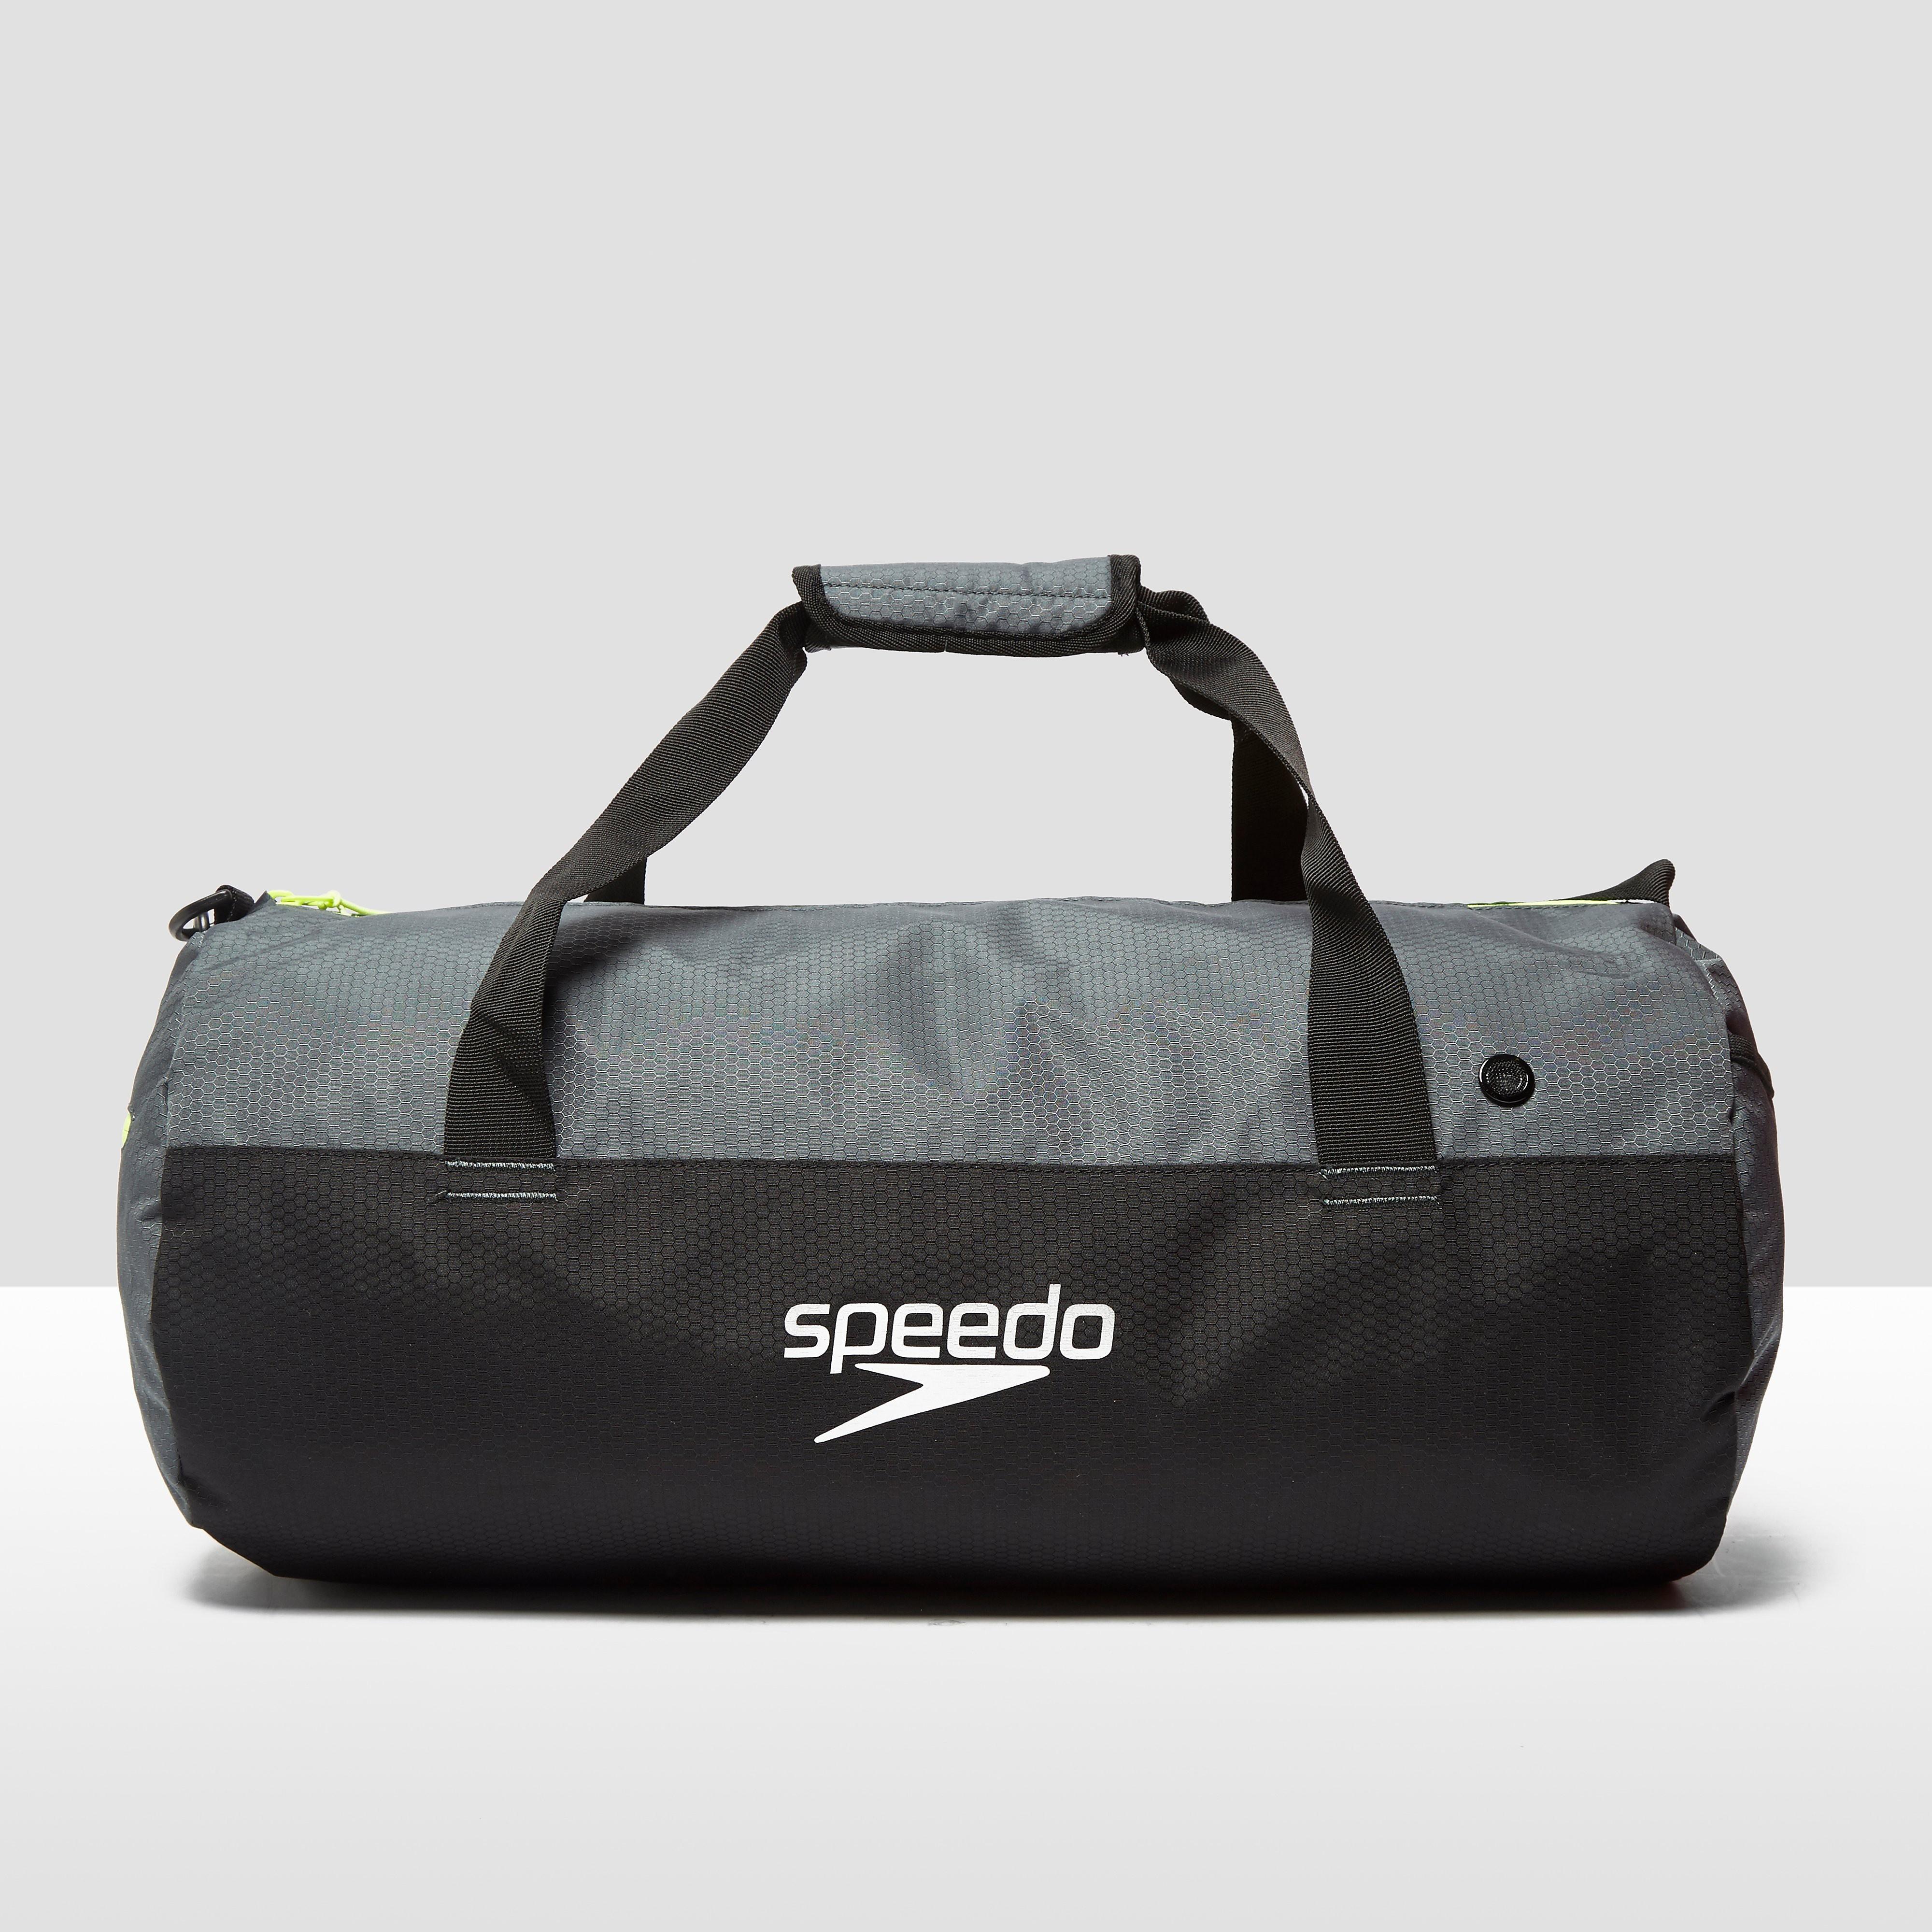 Speedo Duffle Bag